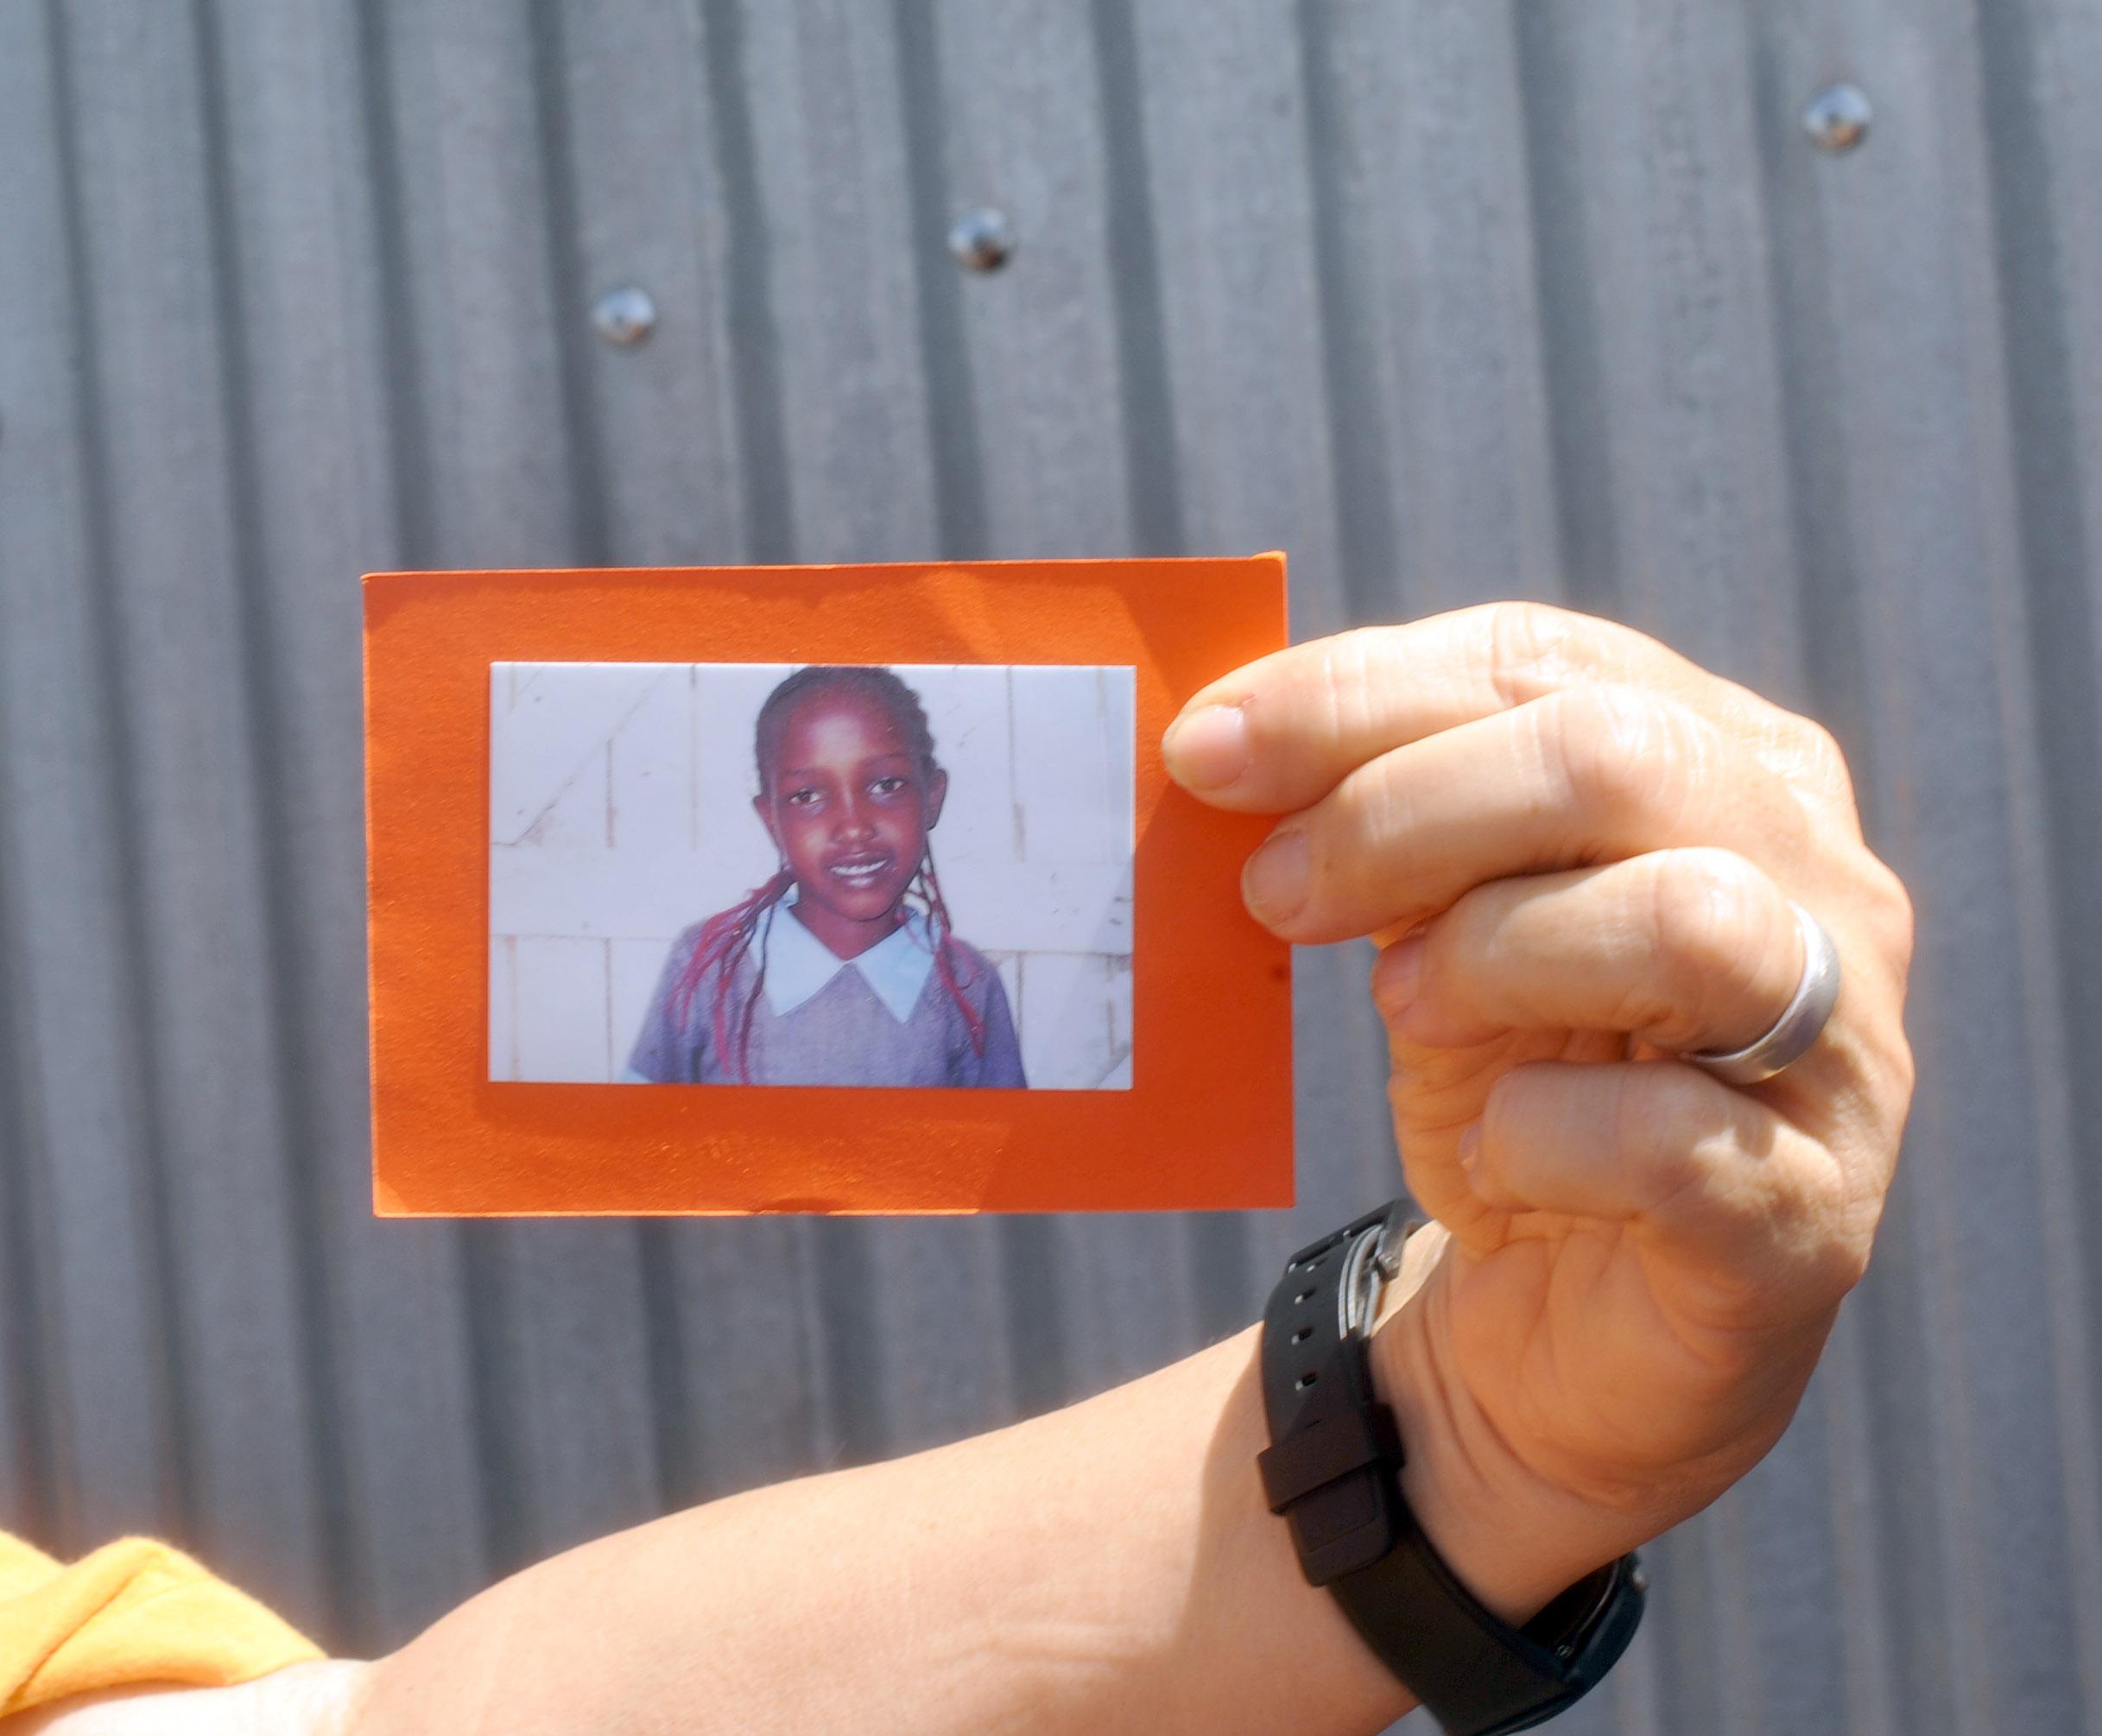 Example of a the nphotos taken of the Maasai children